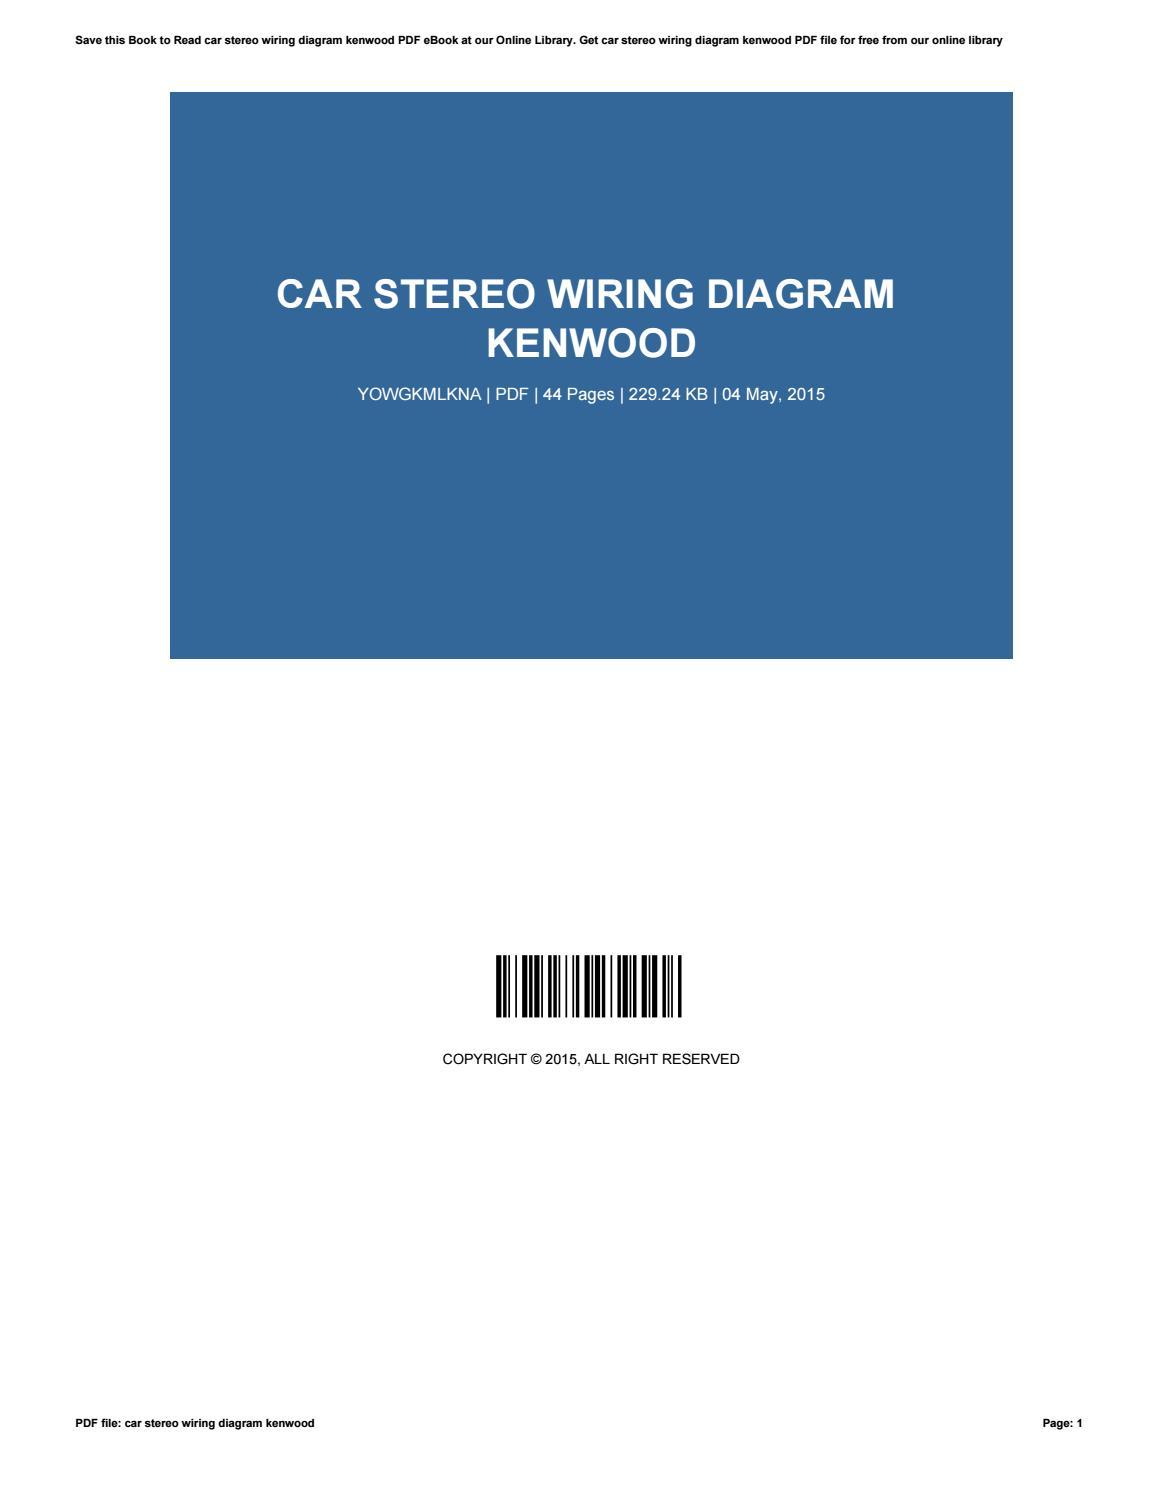 Car Stereo Wiring Diagram Kenwood By Patriciavallejo3376